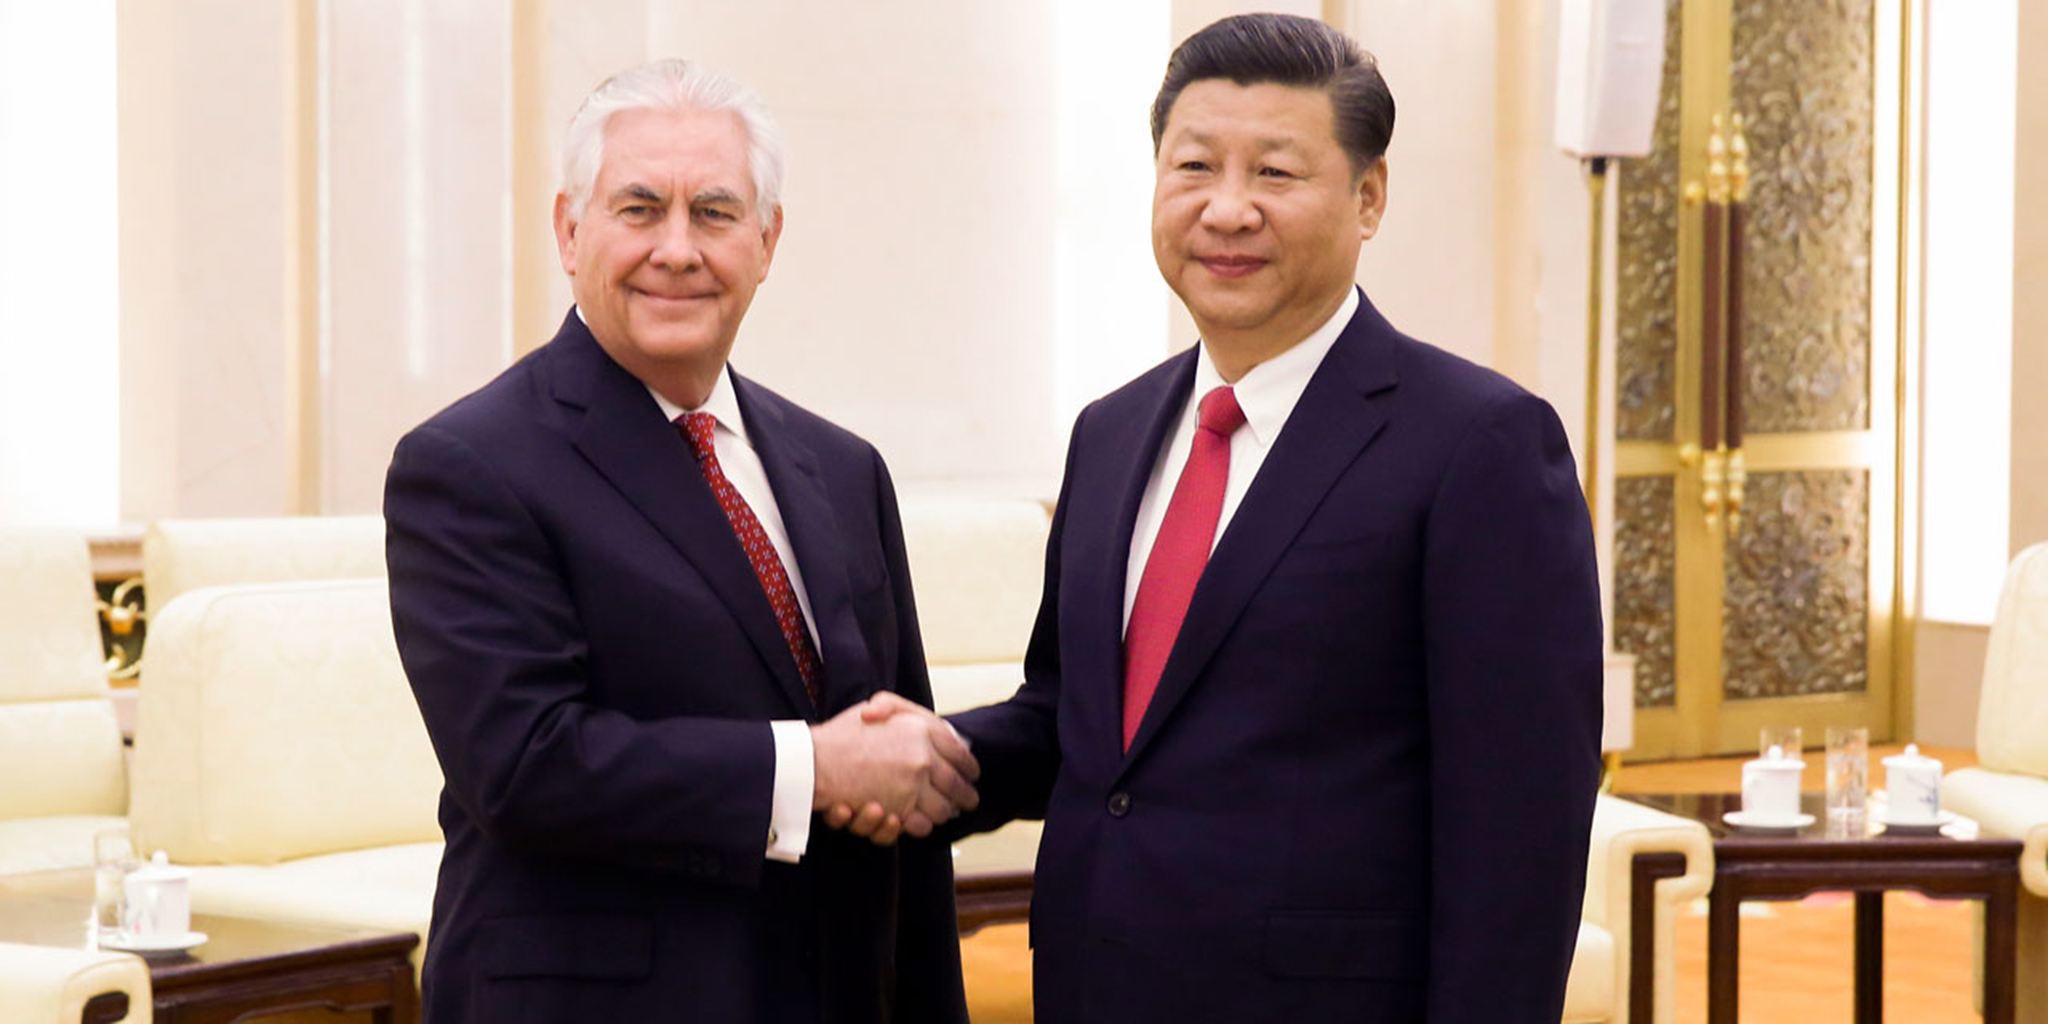 Xi Jinping e Rex Tillerson prometem fortalecer laços entre os países